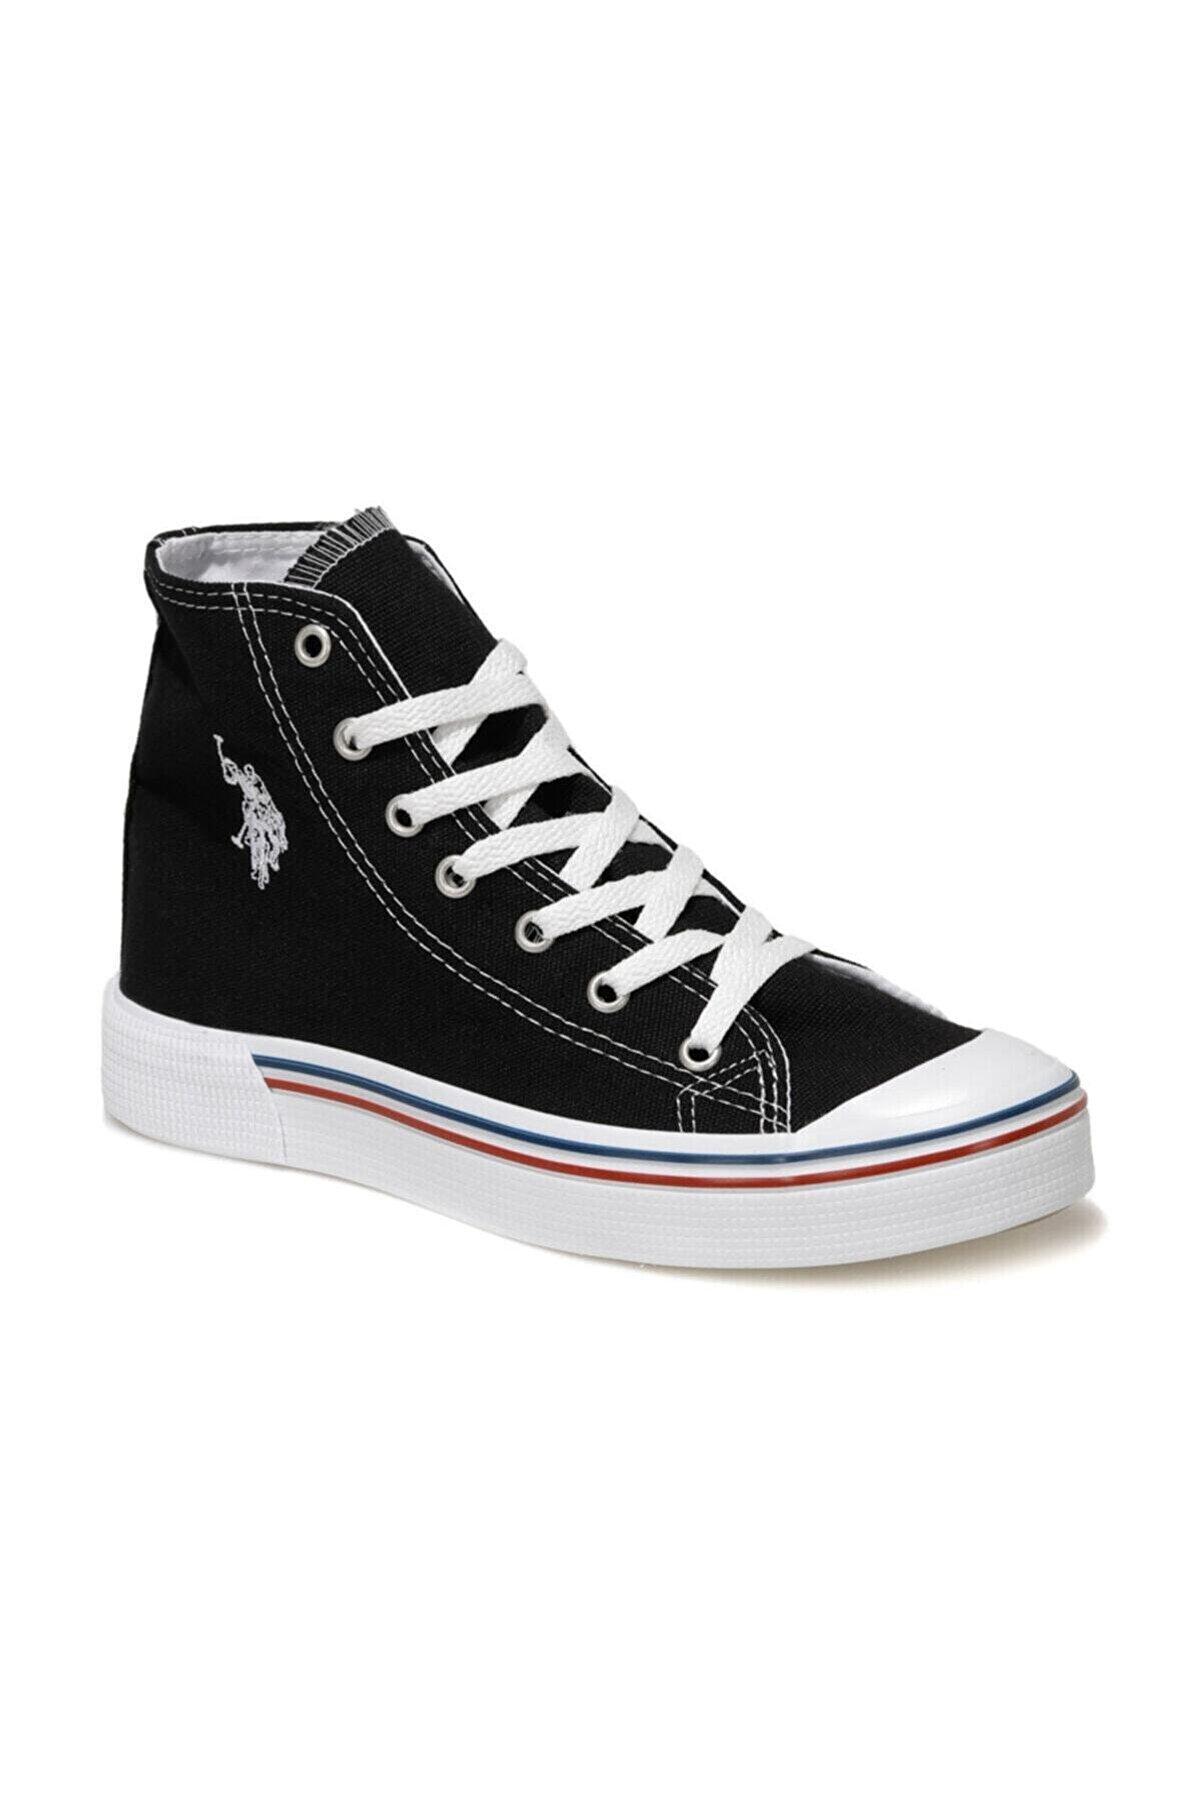 US Polo Assn PENELOPE HIGH 1FX Siyah Kadın Havuz Taban Sneaker 100910634